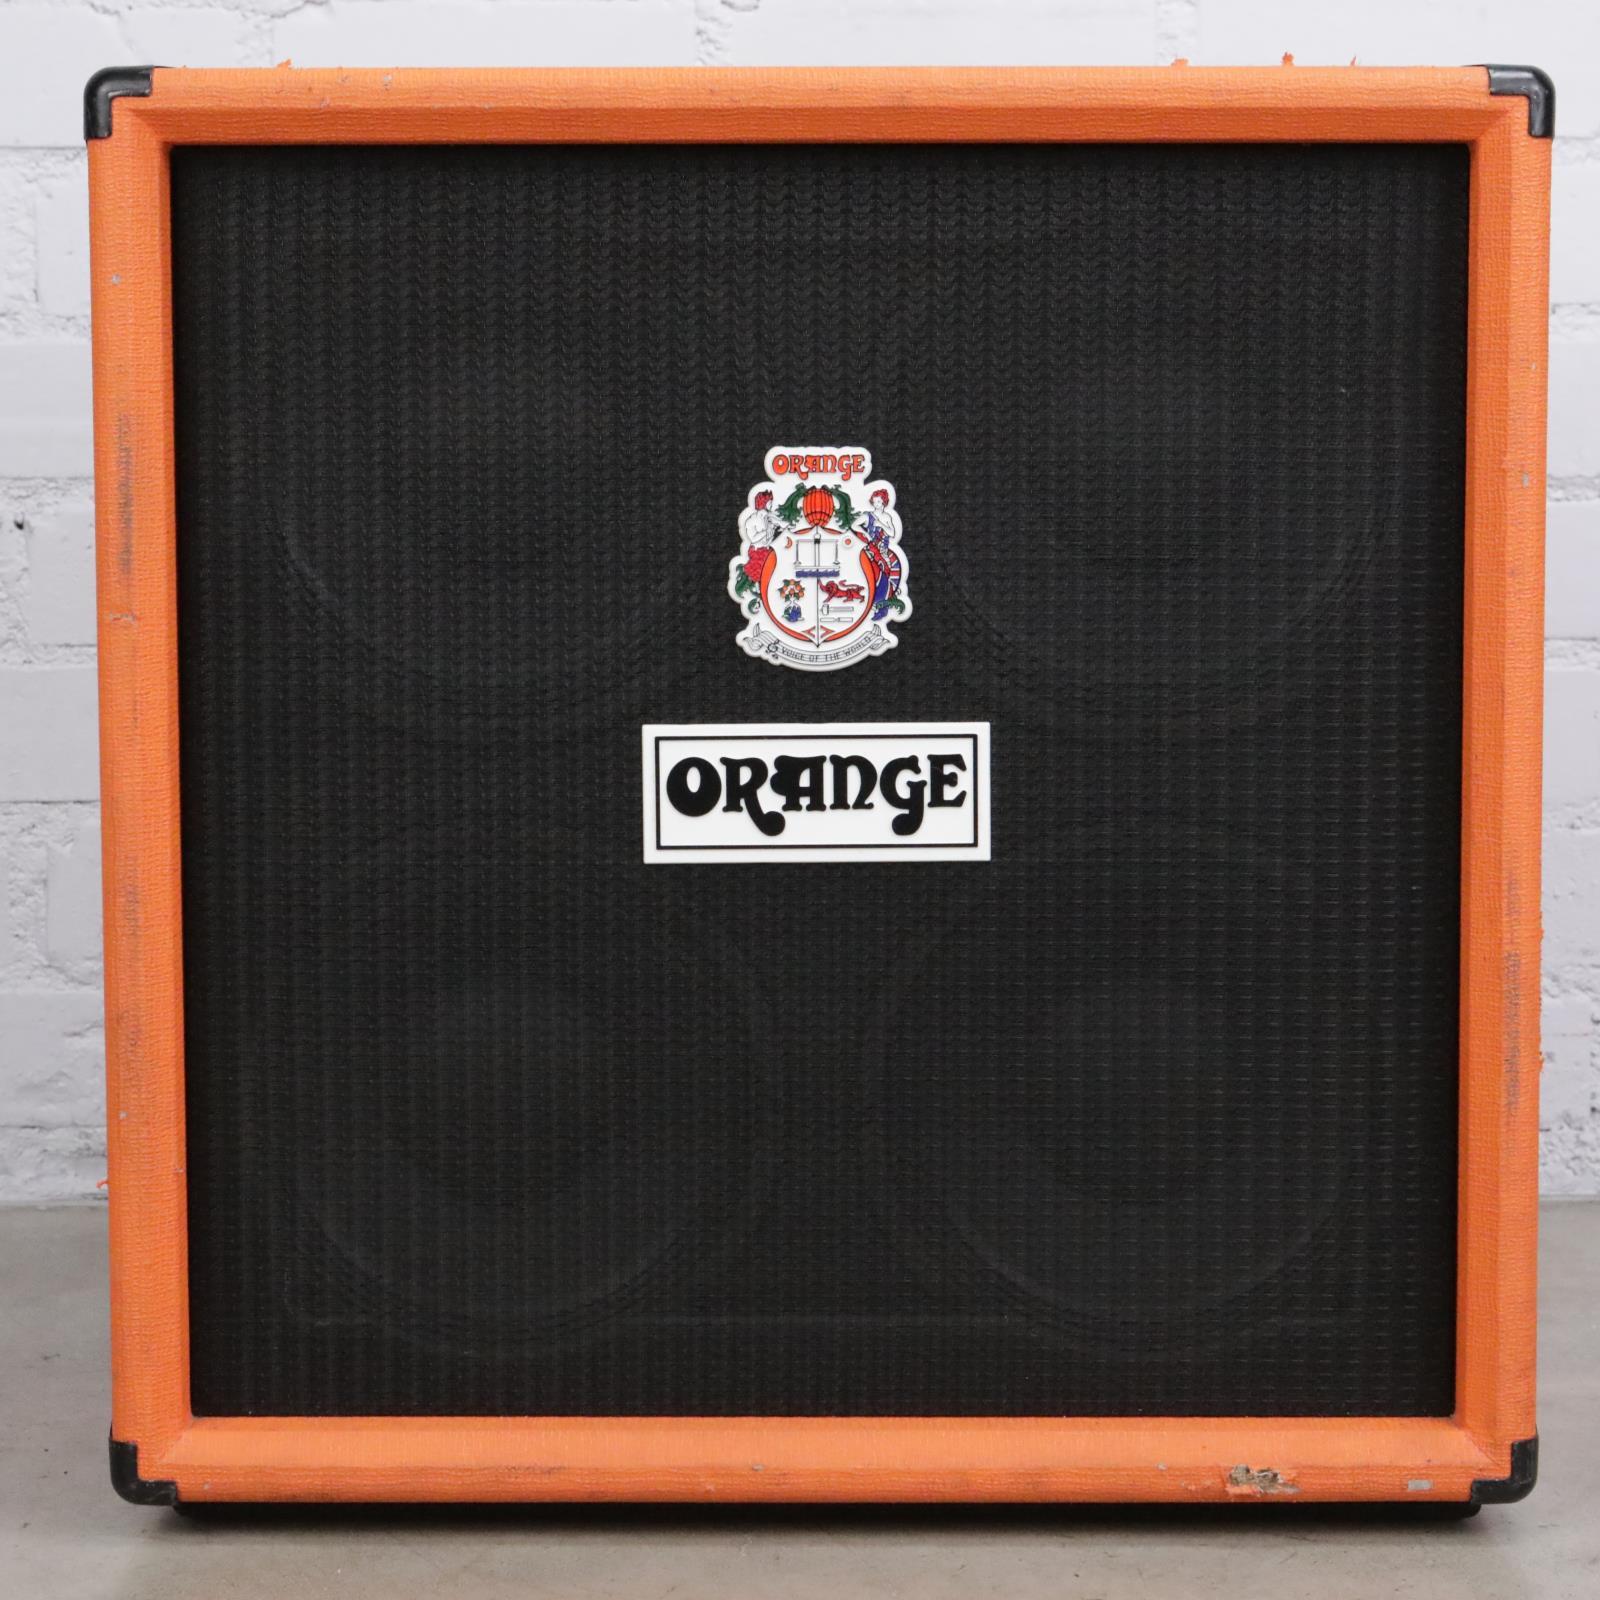 "Orange OBC410 4x10"" Bass Speaker Cabinet #43096"